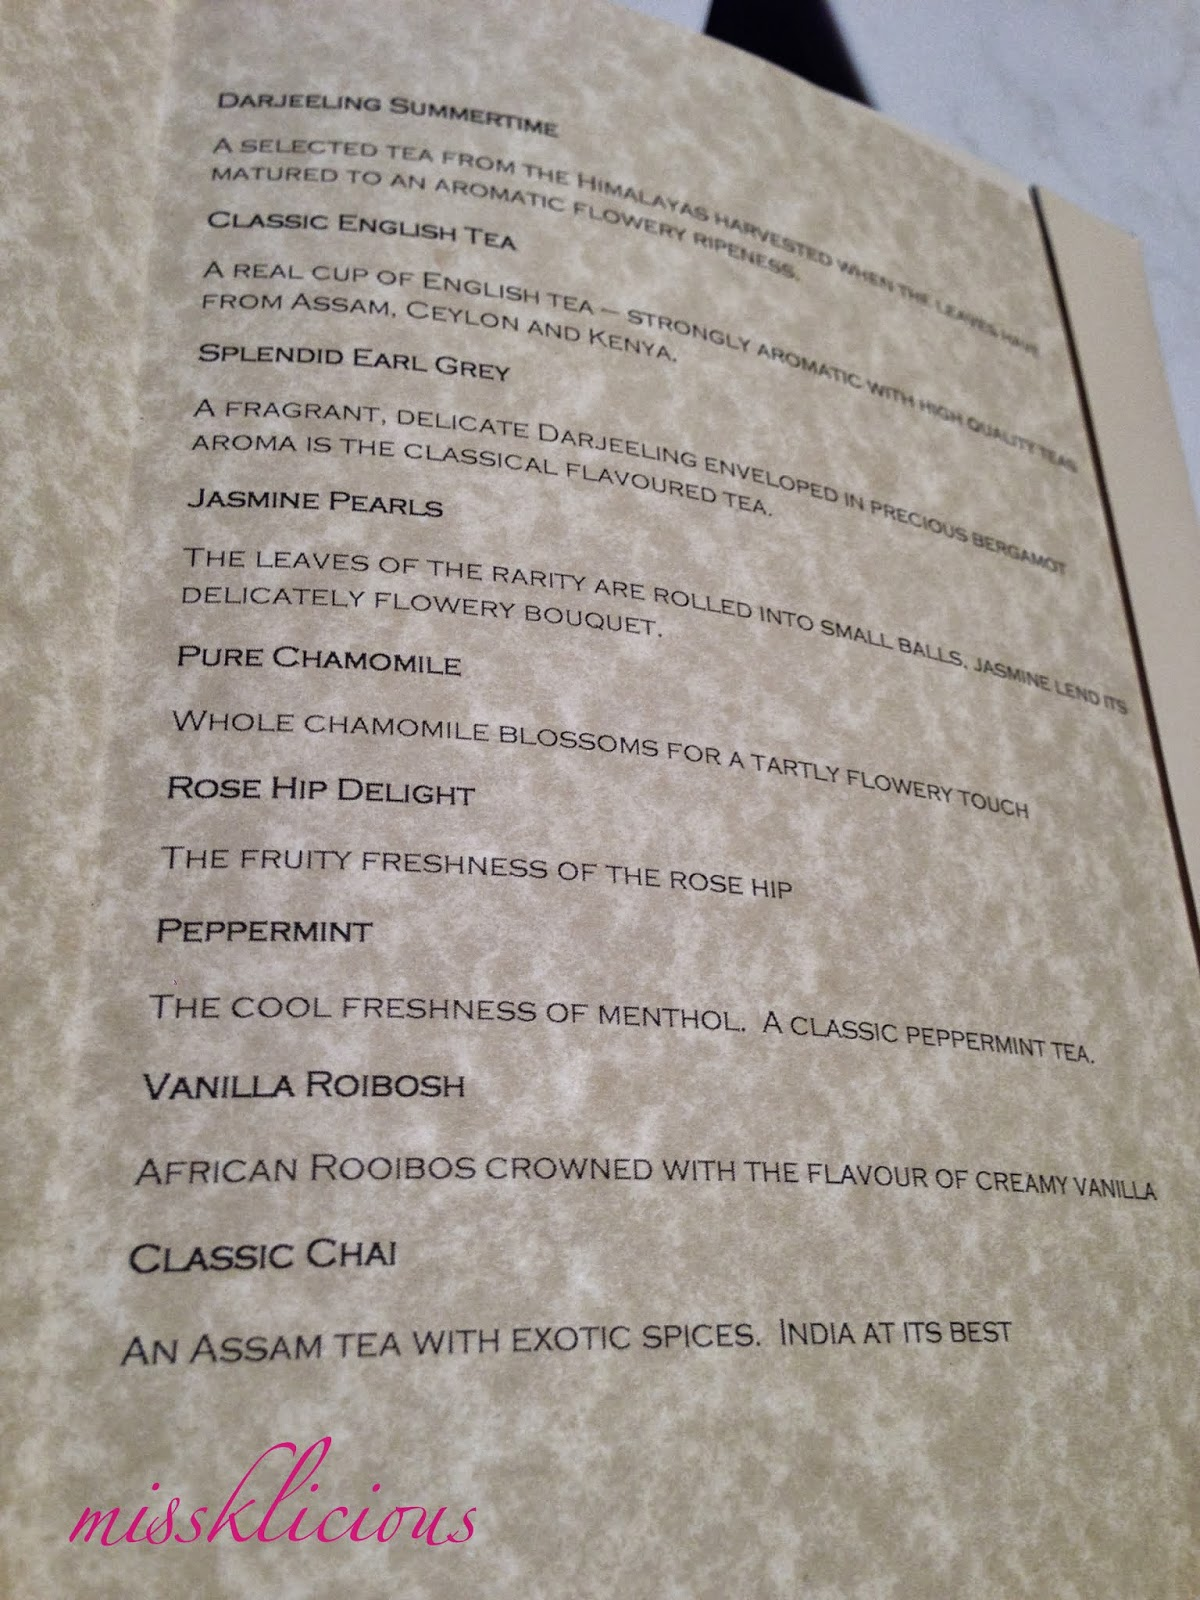 sofitel sydney pillow menu-#28